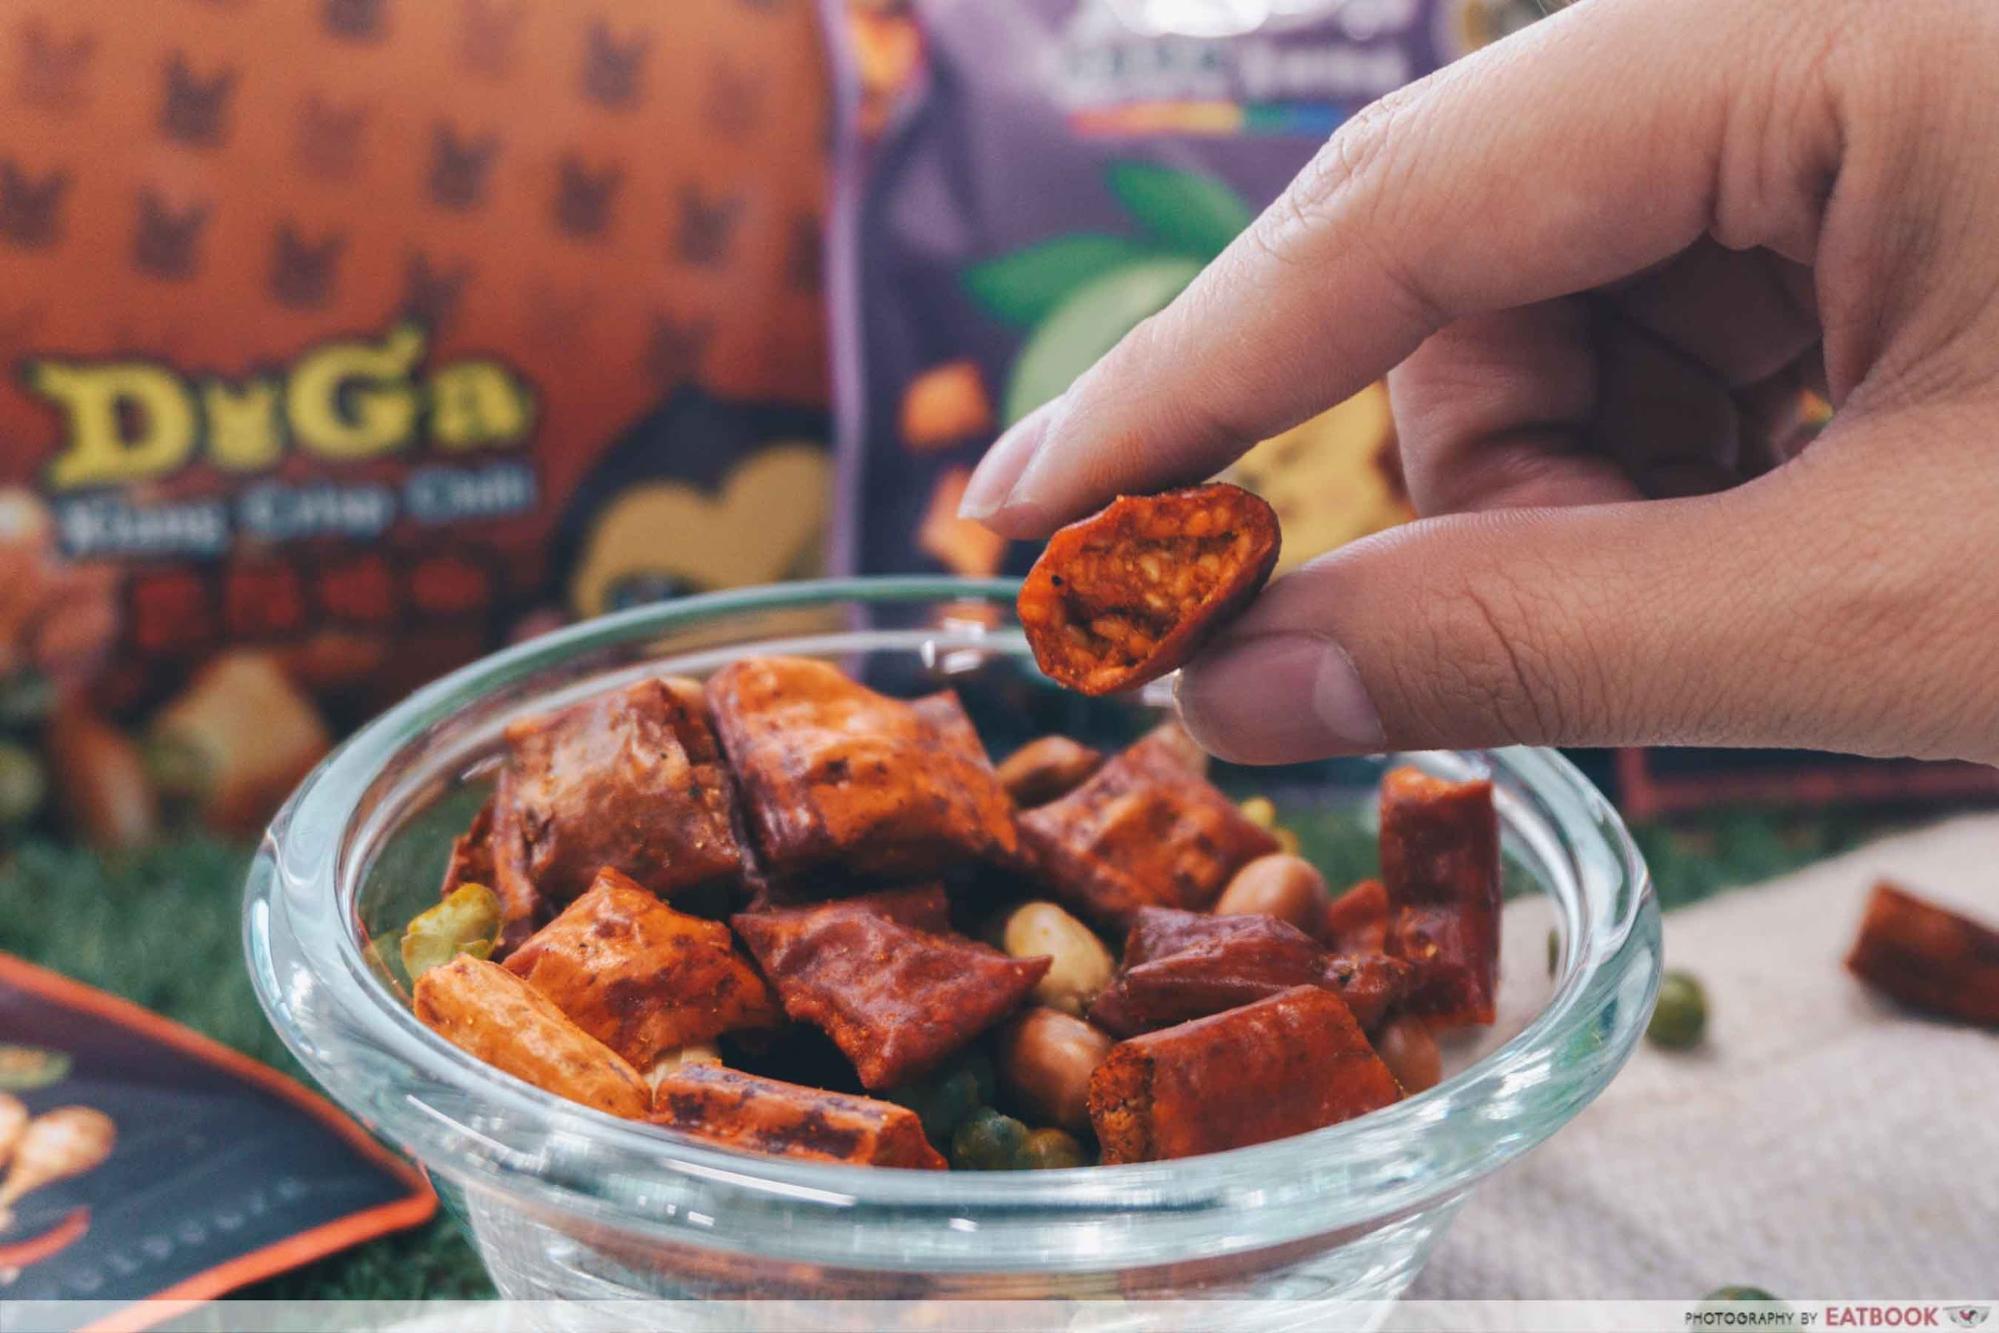 Doga Xiang Crisp Chili - Mala Snacks